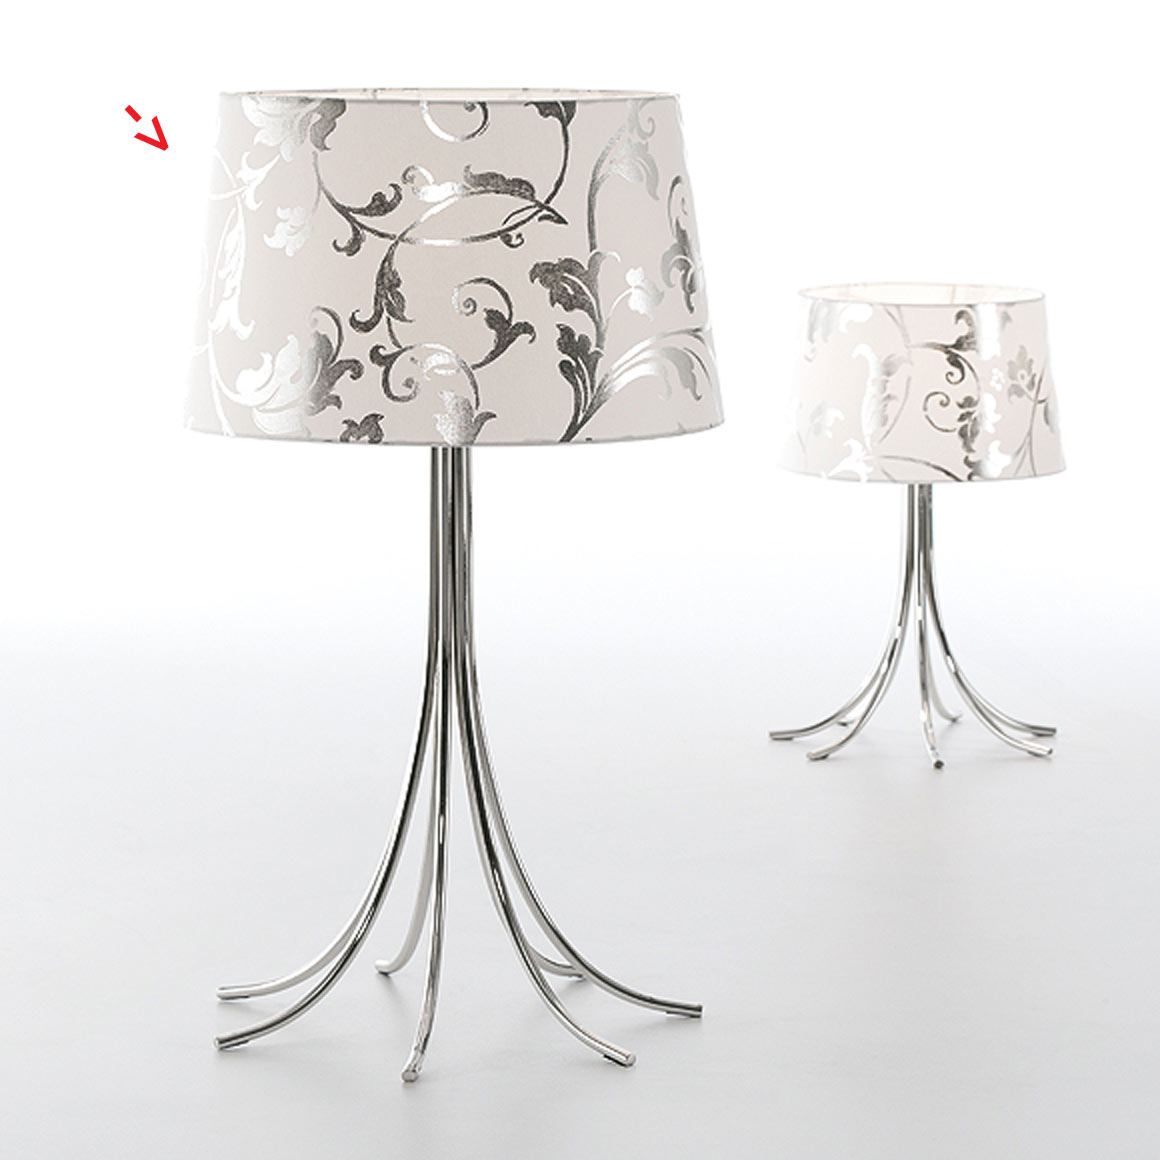 Camber Cromado baroque lampe GM. Paulo Coelho.